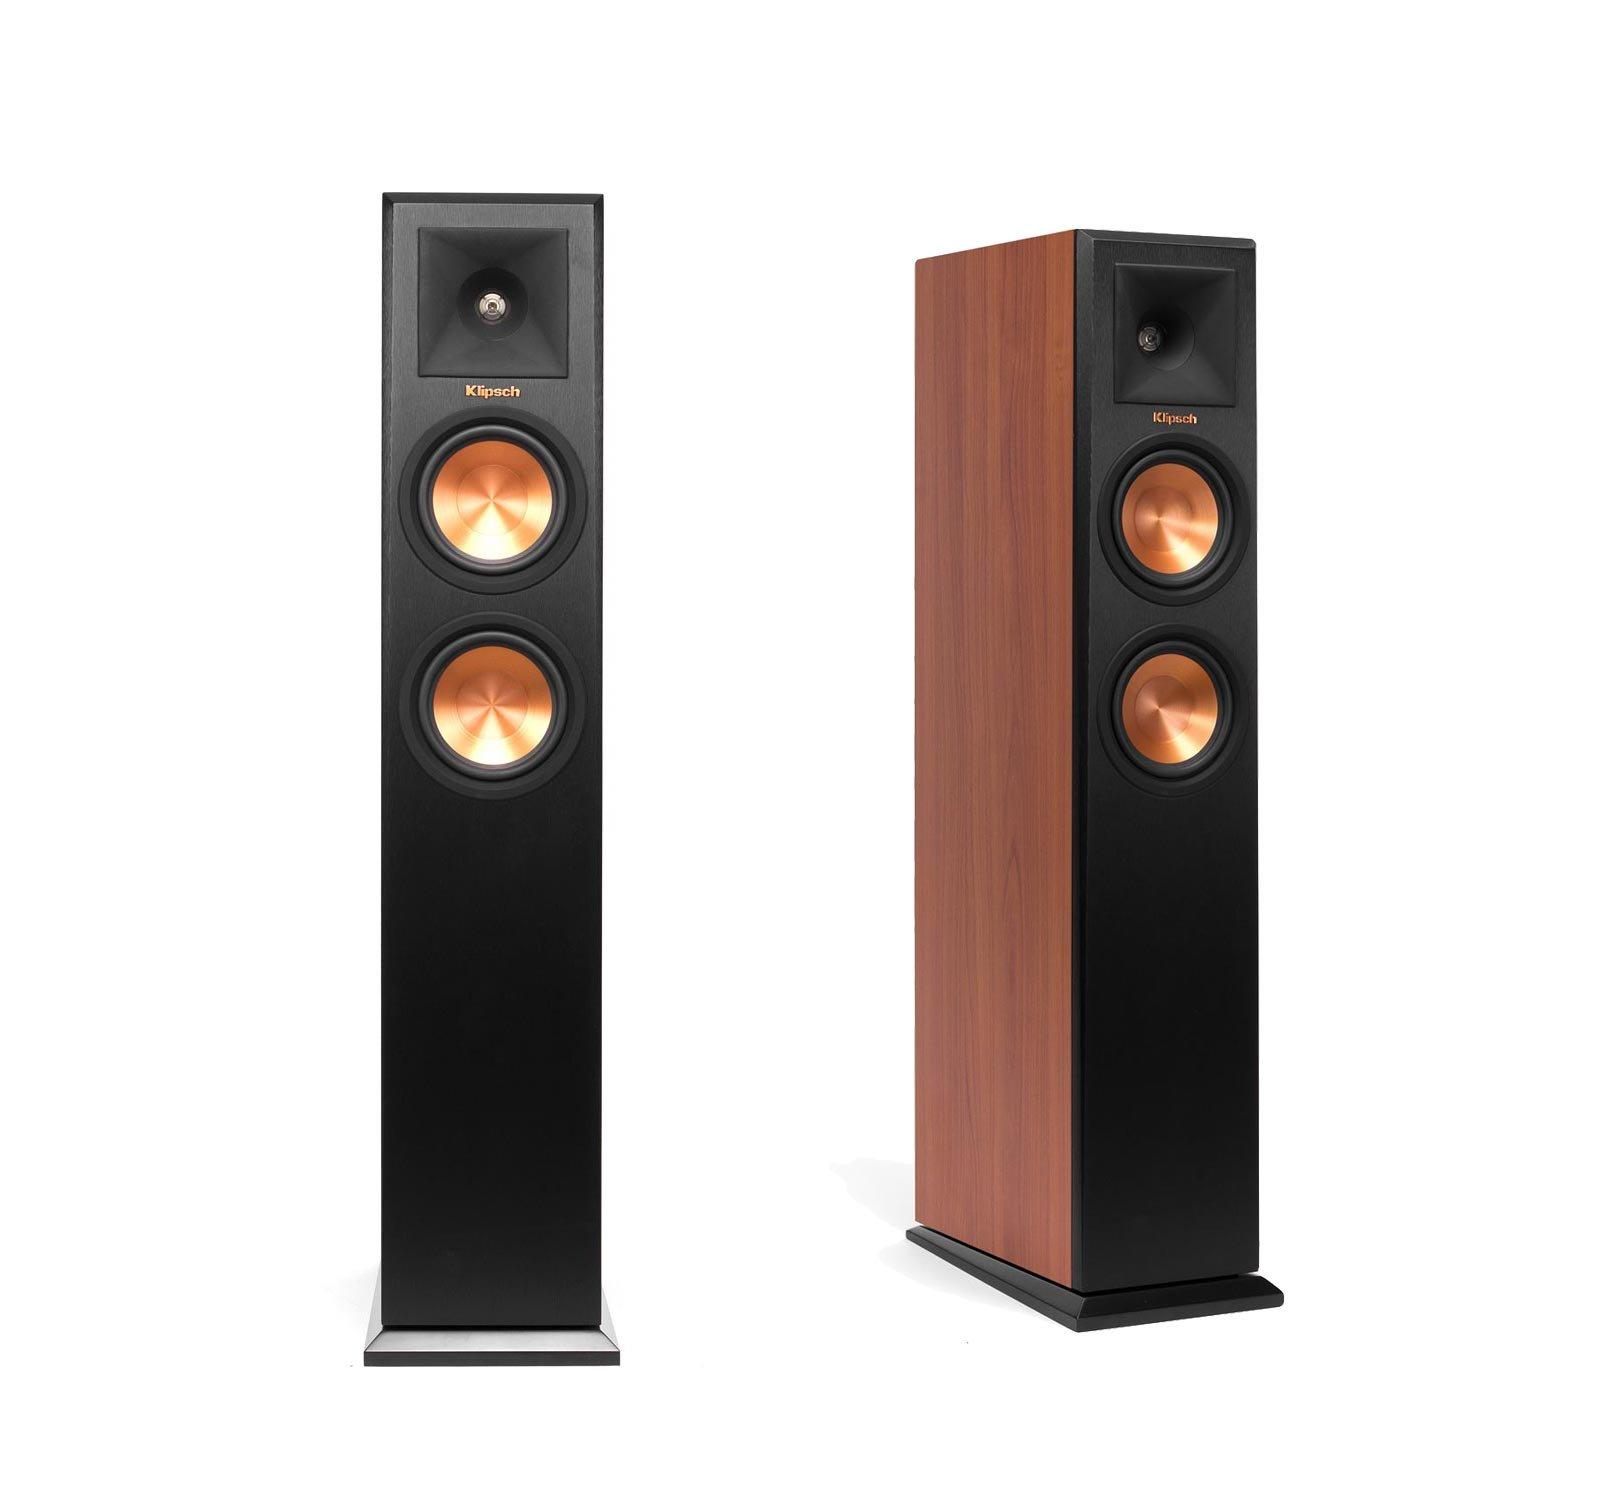 Klipsch RP-250F Reference Premiere Floorstanding Speakers (Cherry Pair)